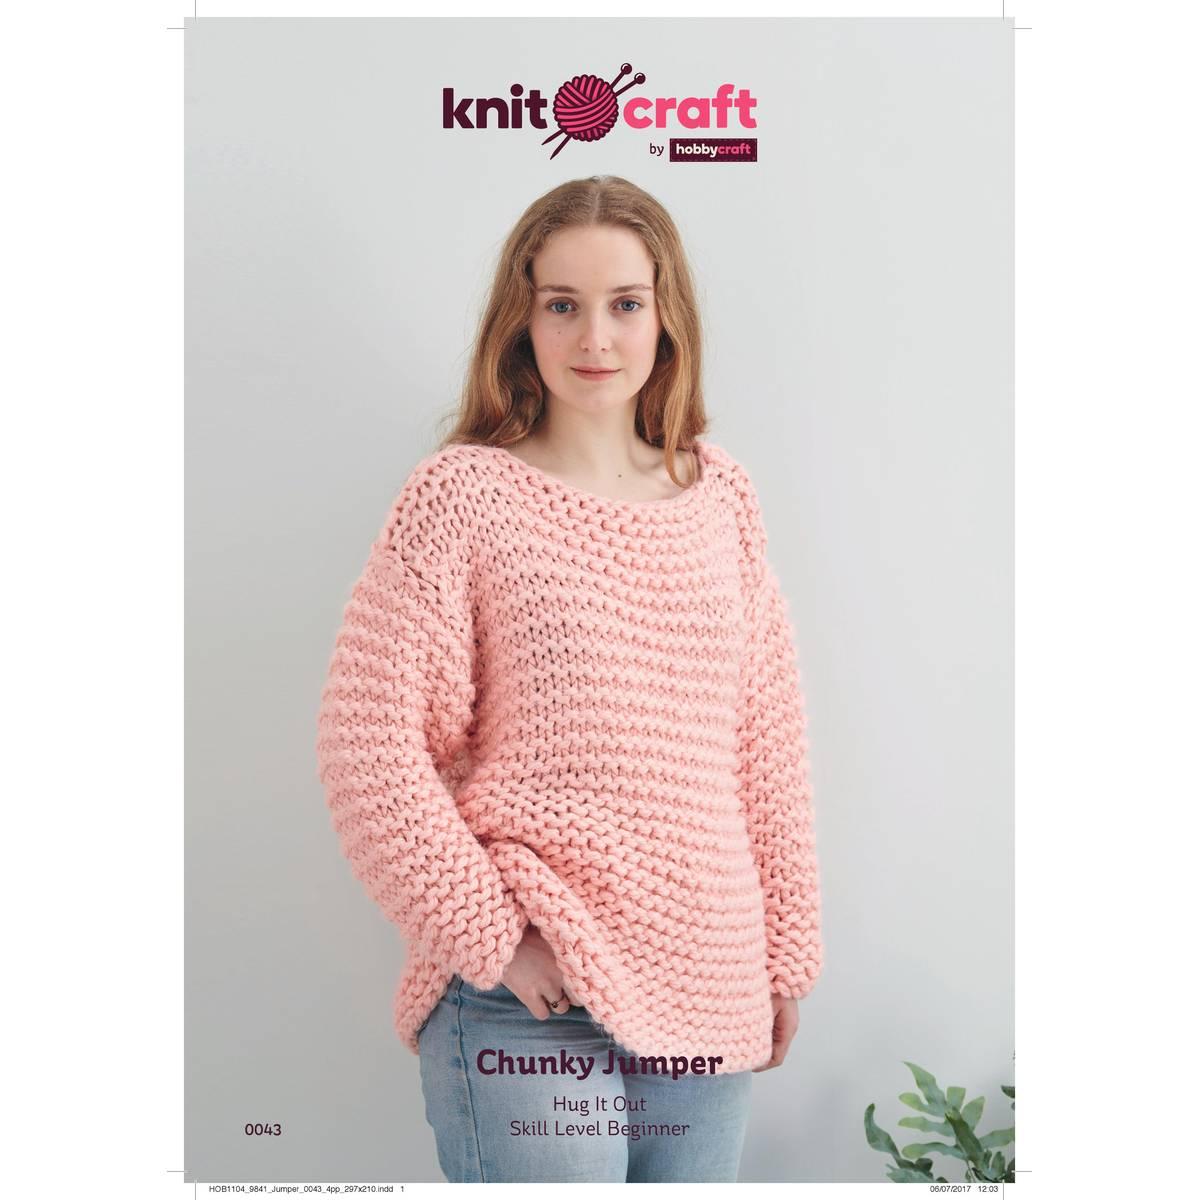 Knit Jumper Pattern Knitcraft Hug It Out Chunky Jumper Digital Pattern 0043 Hobcraft